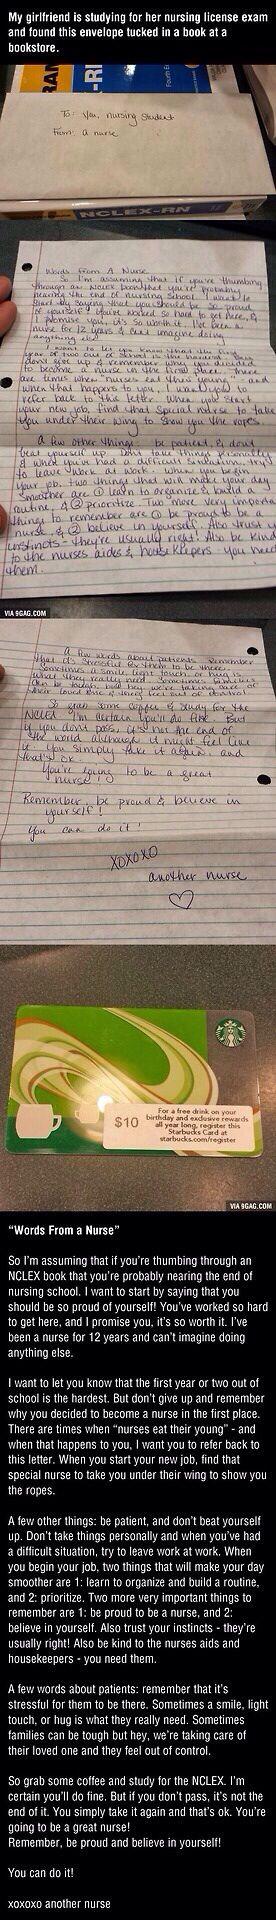 Nursing school generosity!